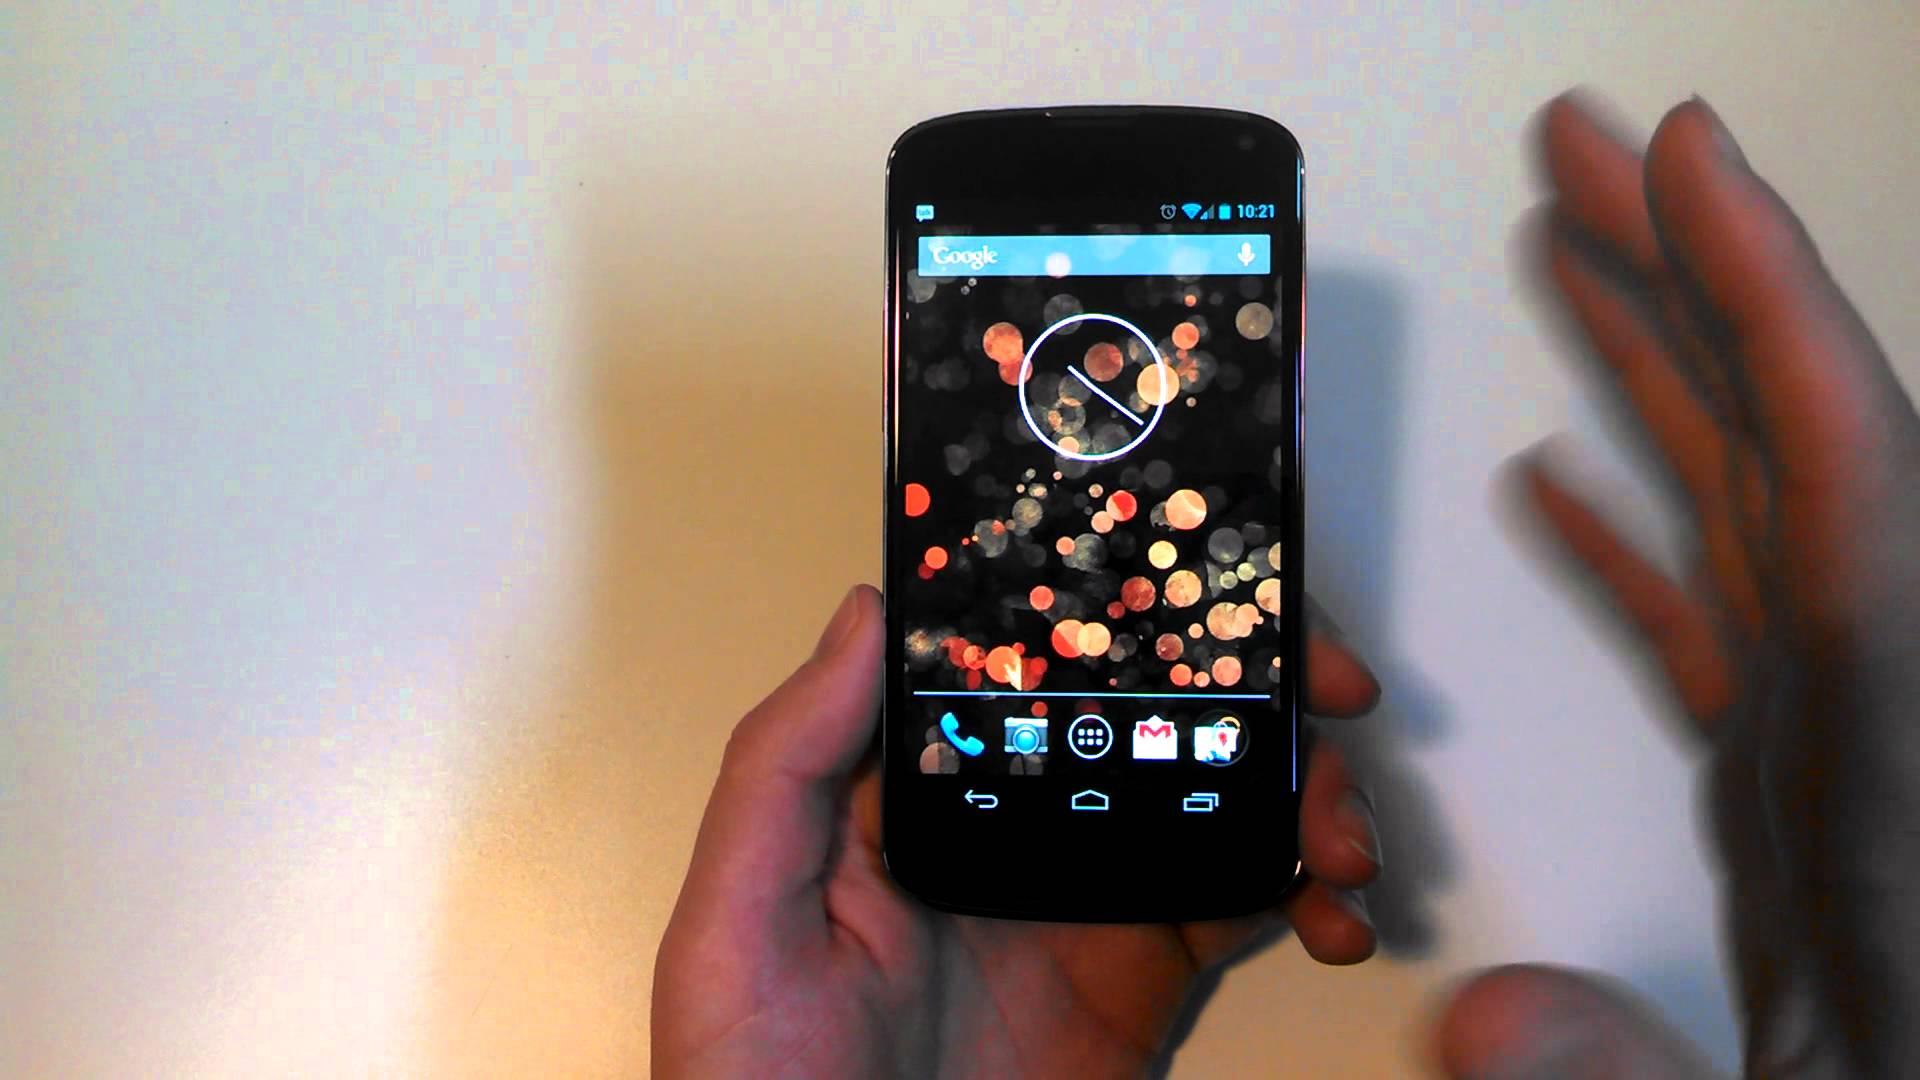 LG-Nexus-4-Review